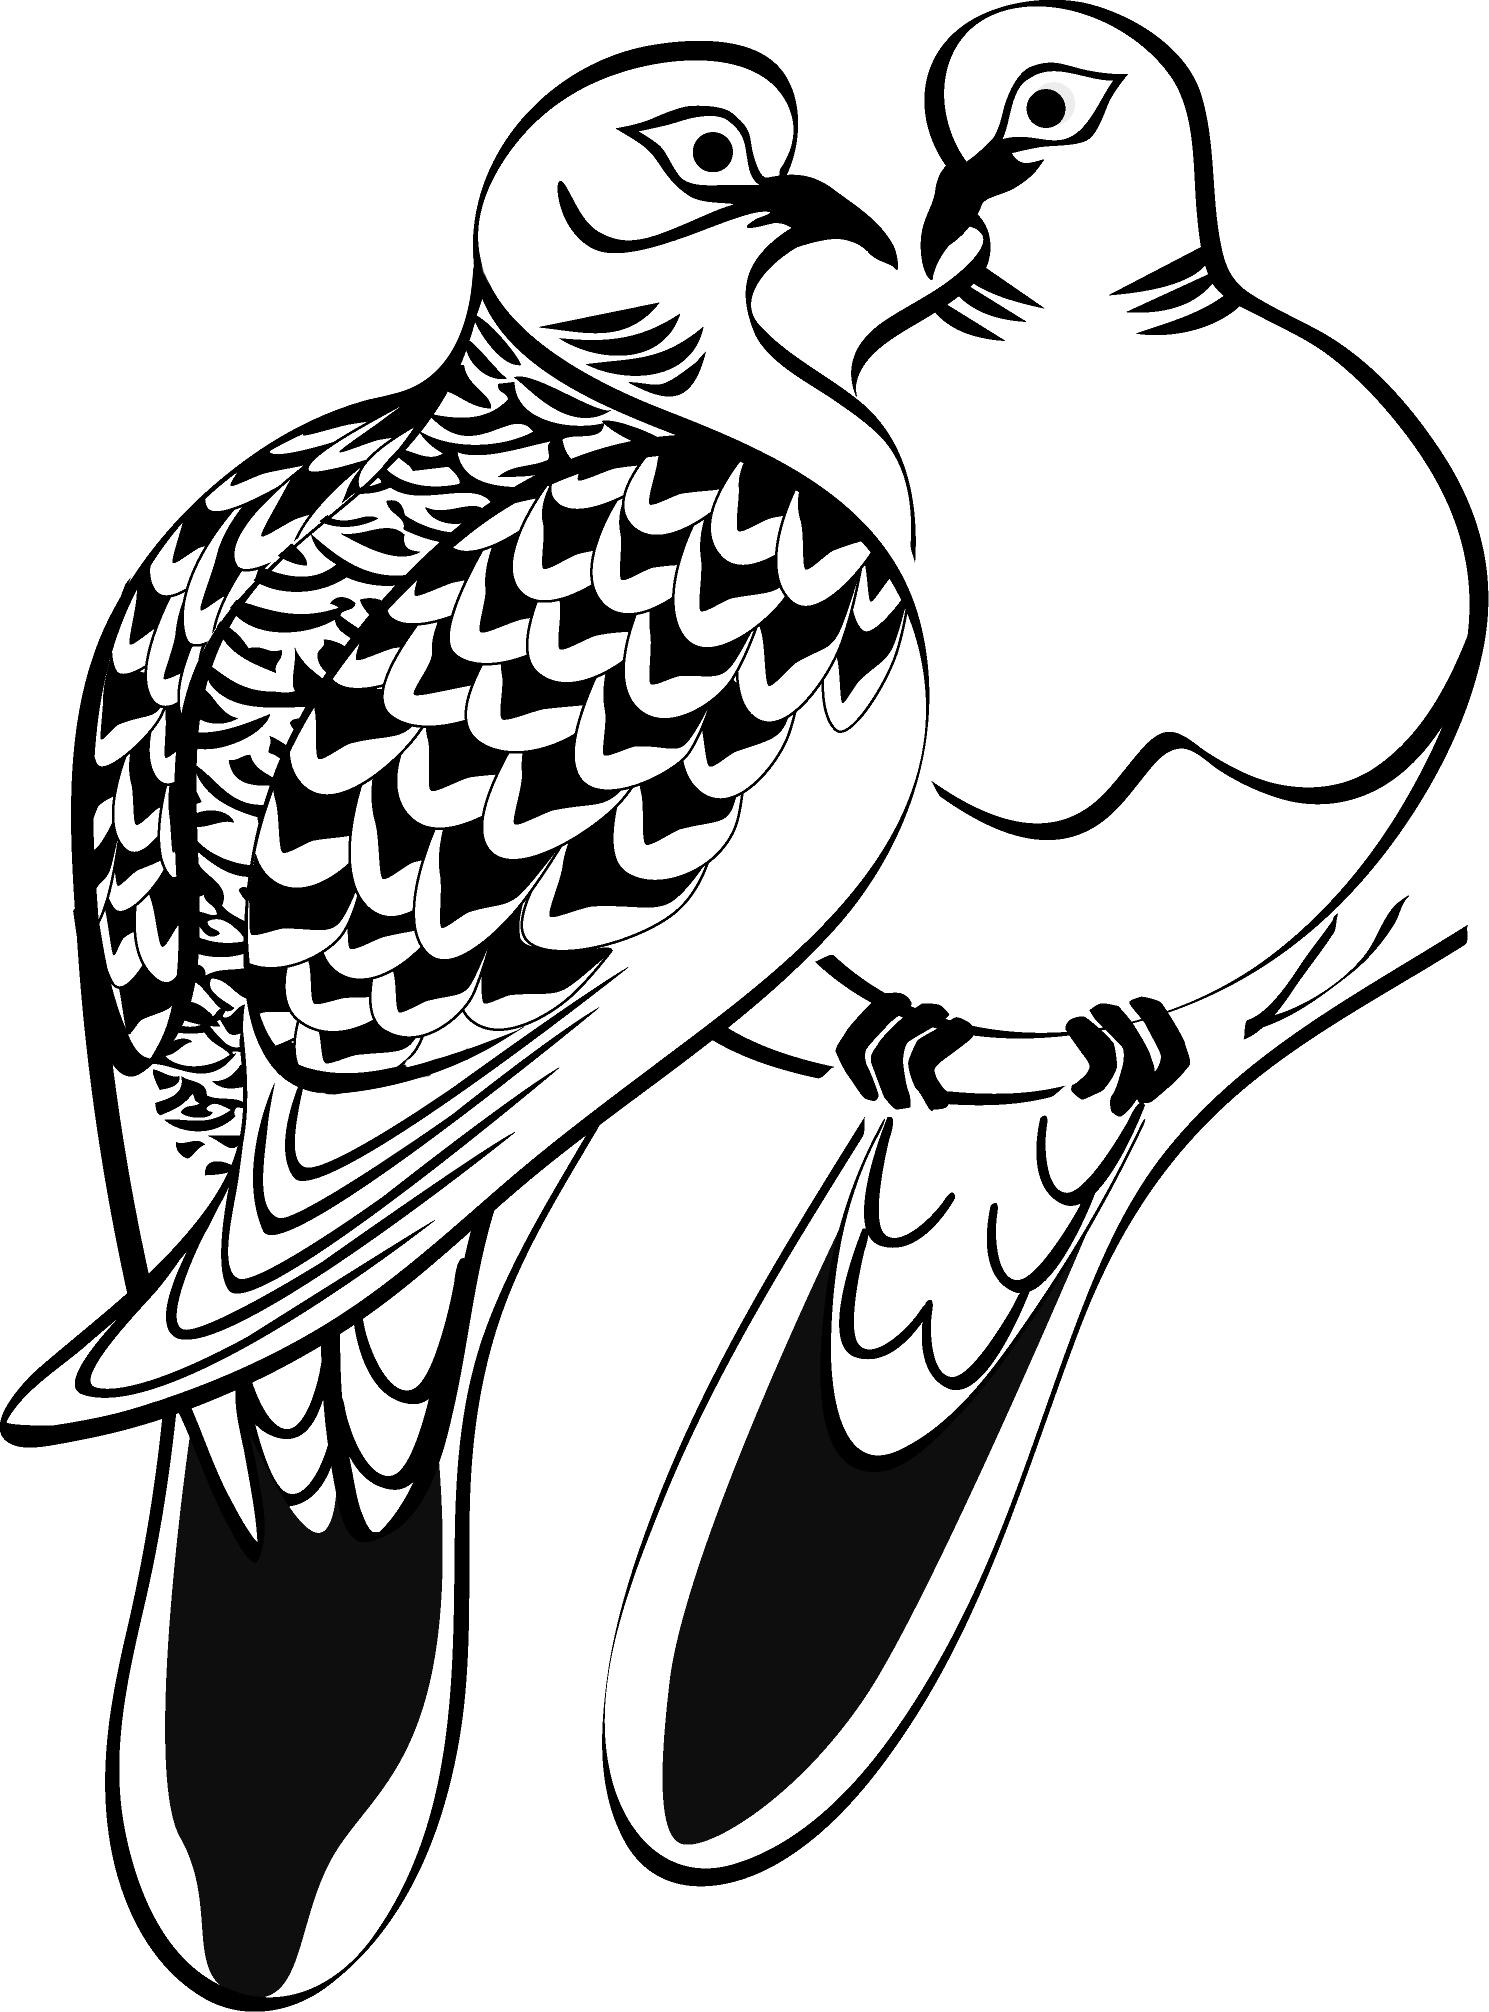 Pidgeons clipart turtle dove Design Line turtle Google Google